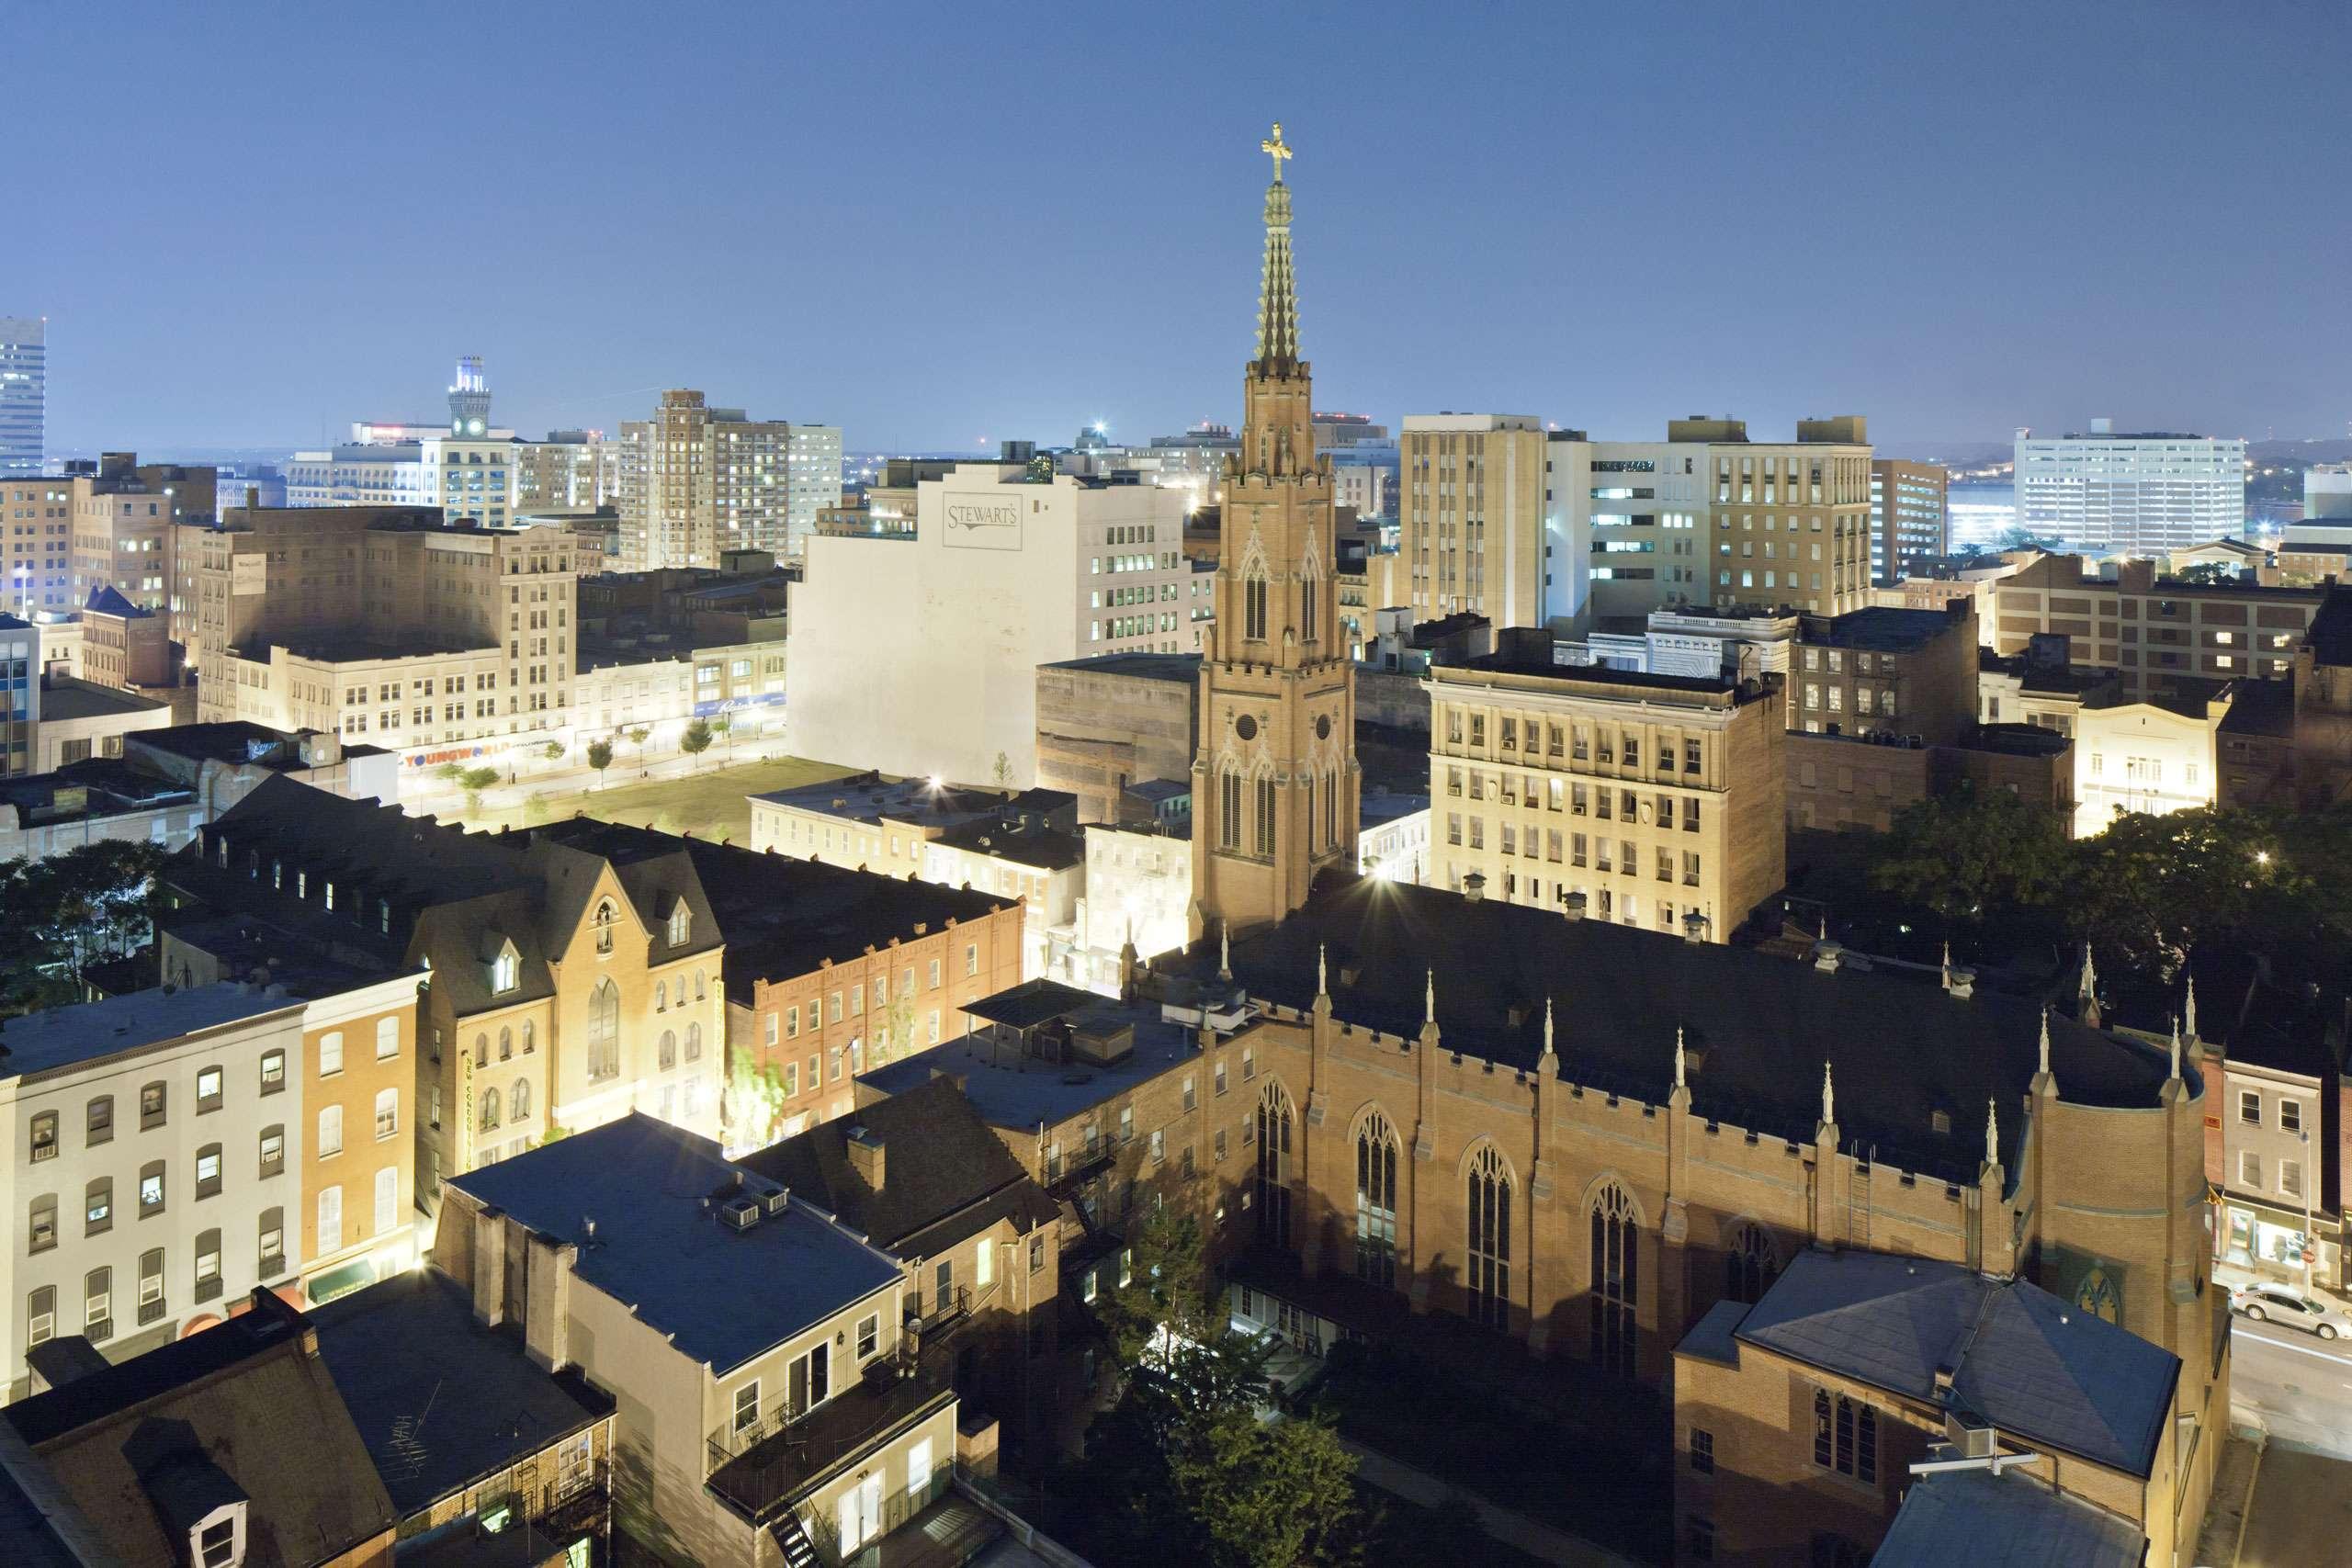 PORTFOLIO - Baltimore - Neighborhoods  #5